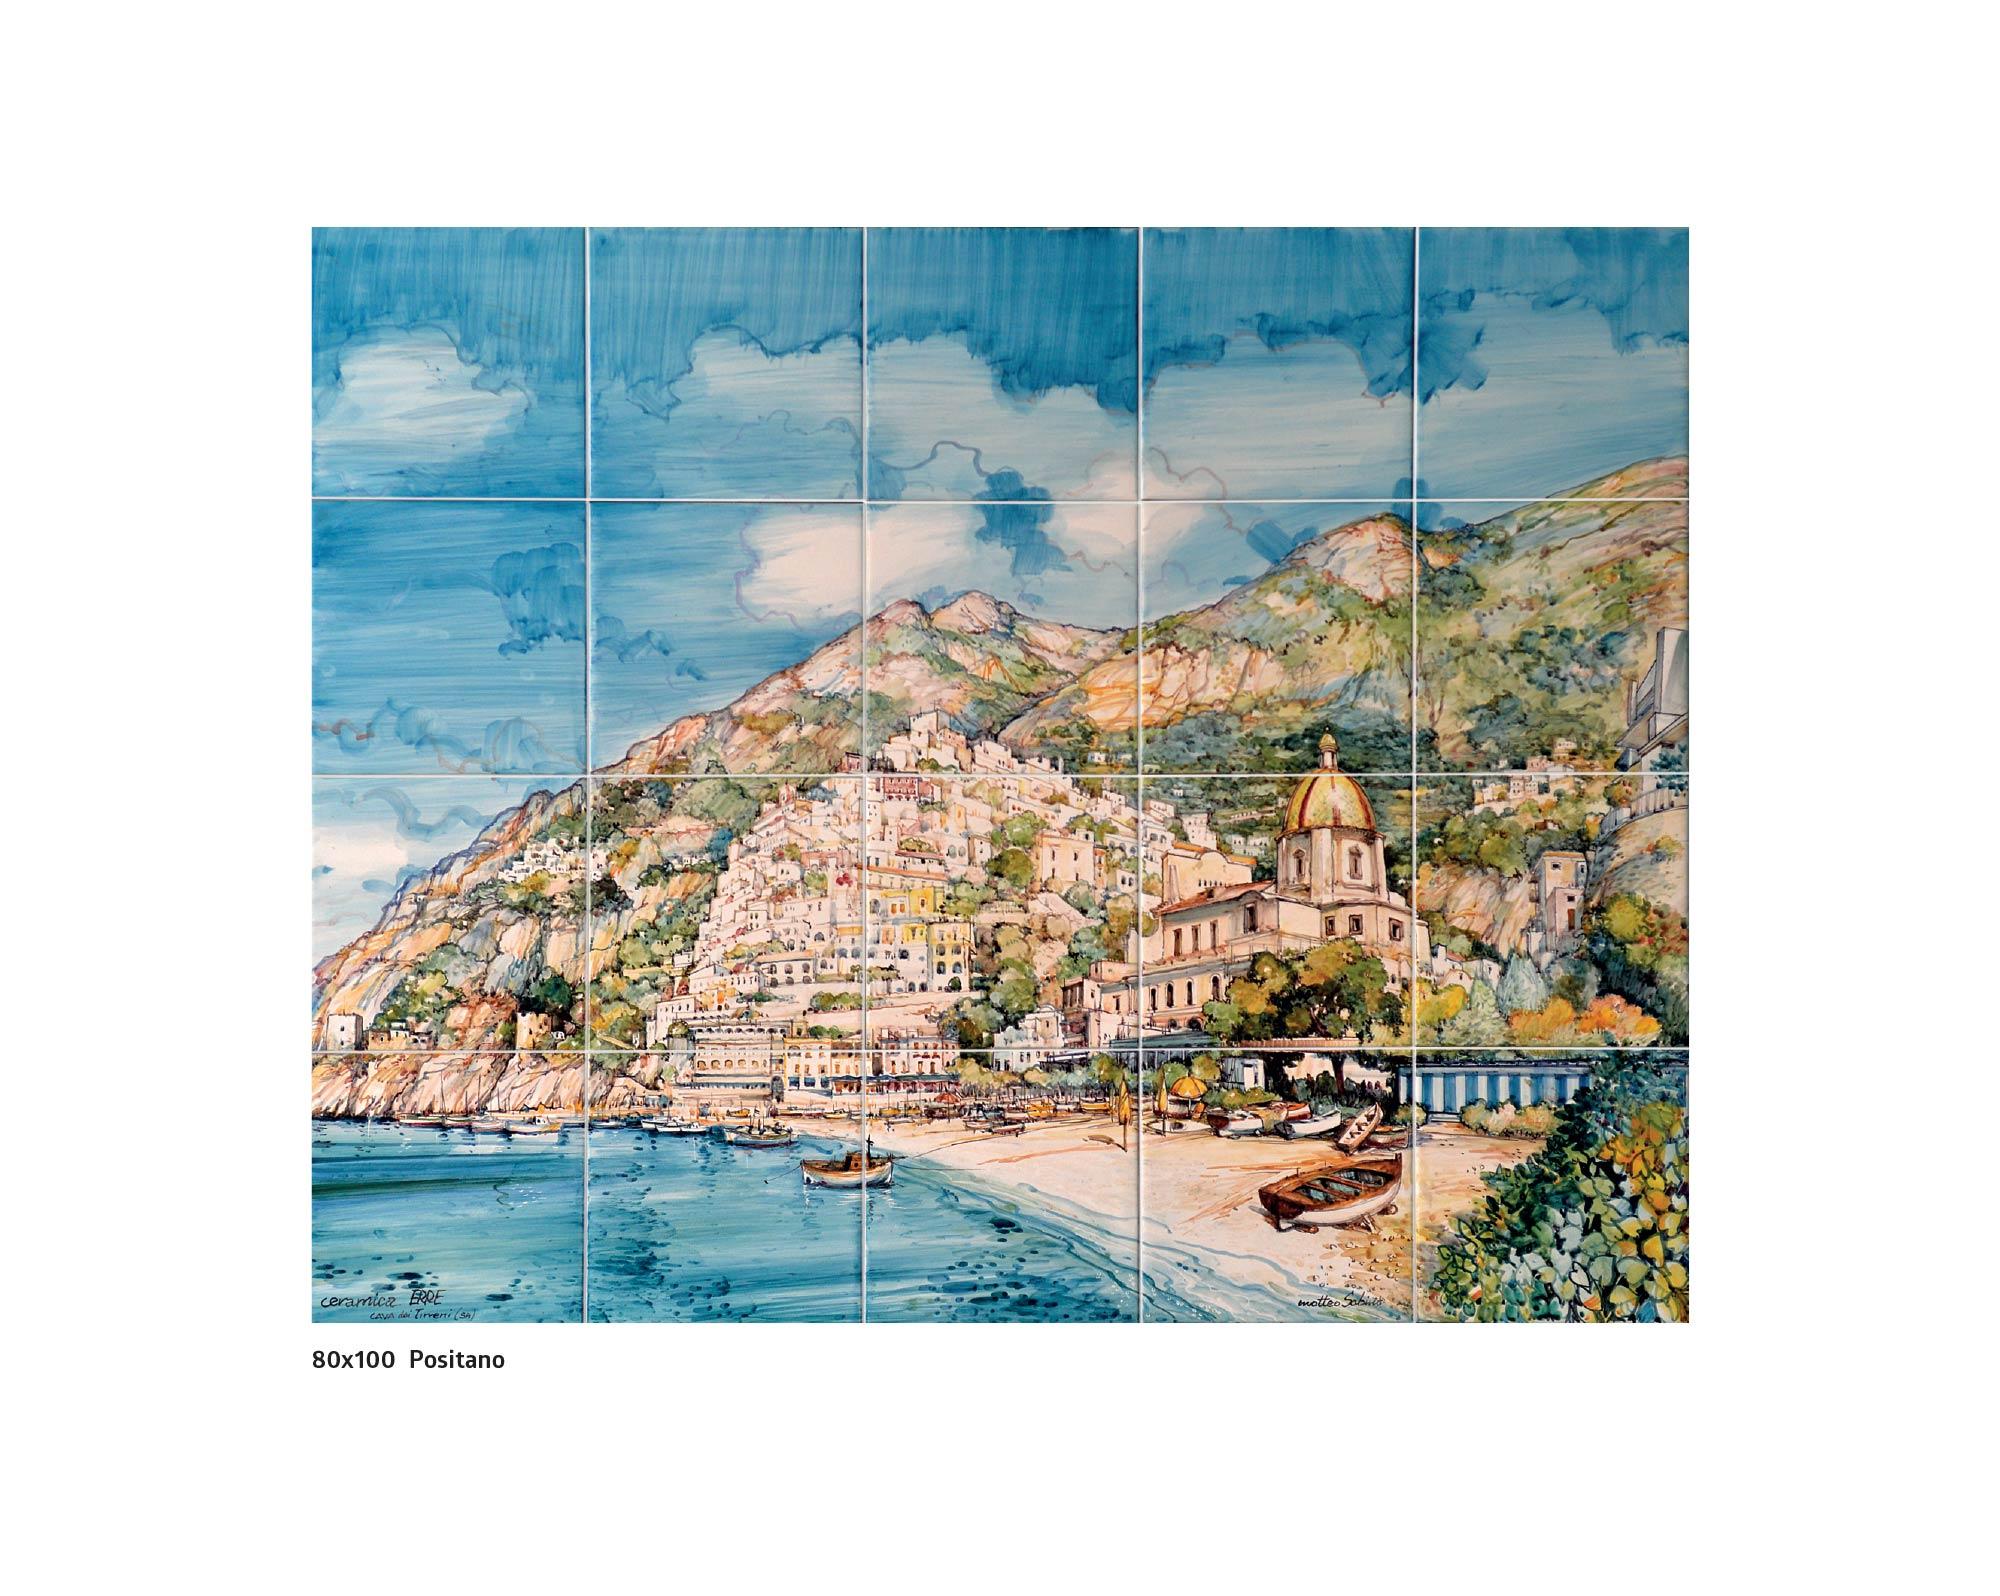 pannelli artistici - 20x20